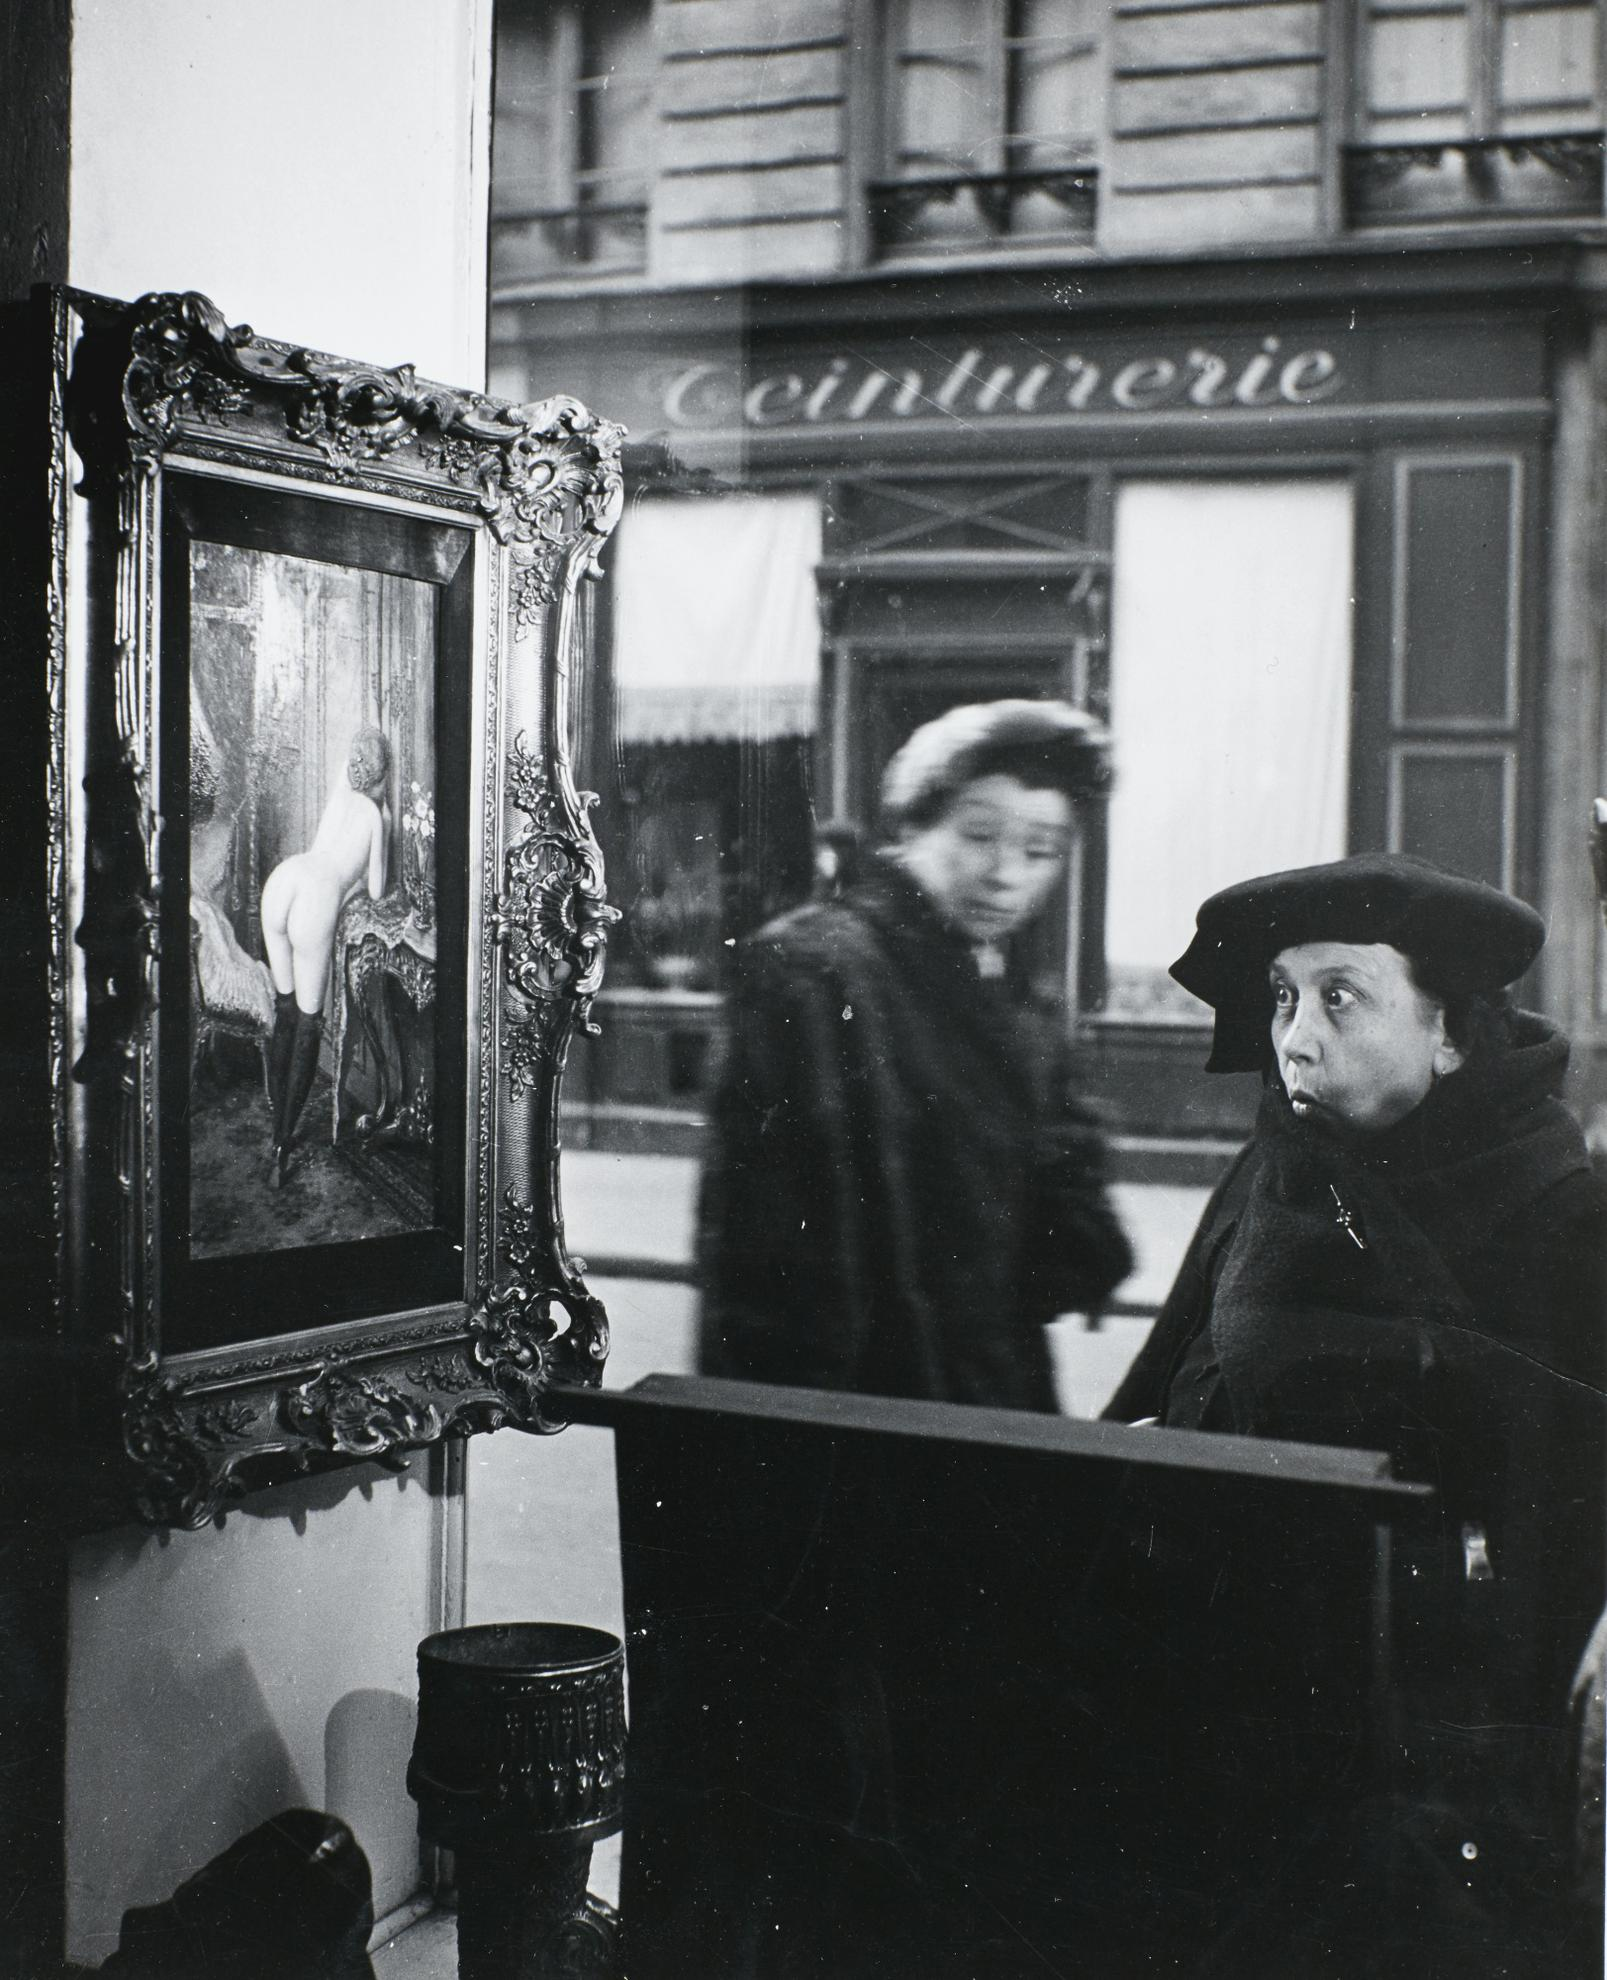 Robert Doisneau-La Dame Indignee, The Romi Gallery, Paris-1947